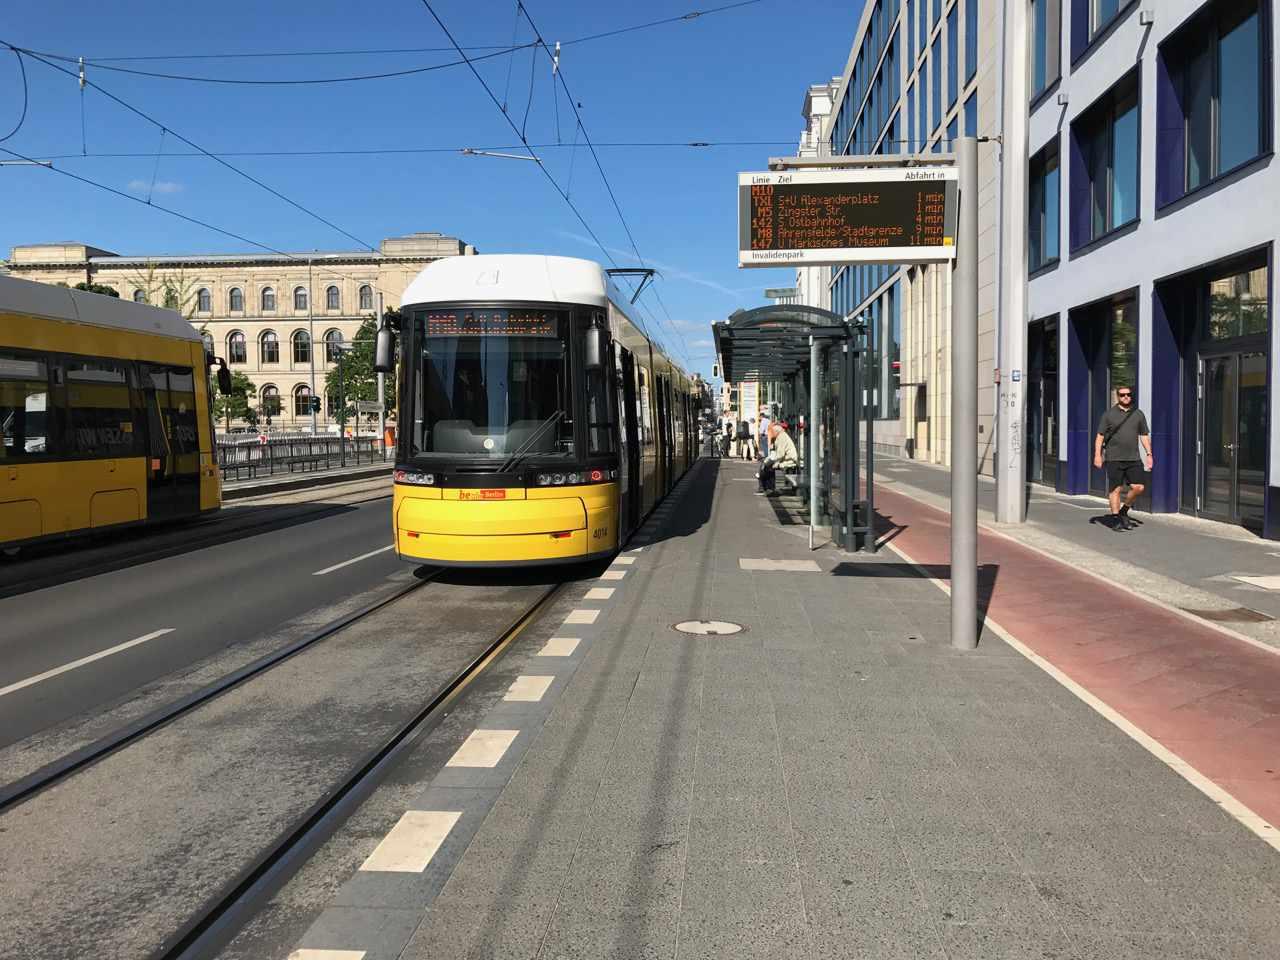 A streetcar in Berlin